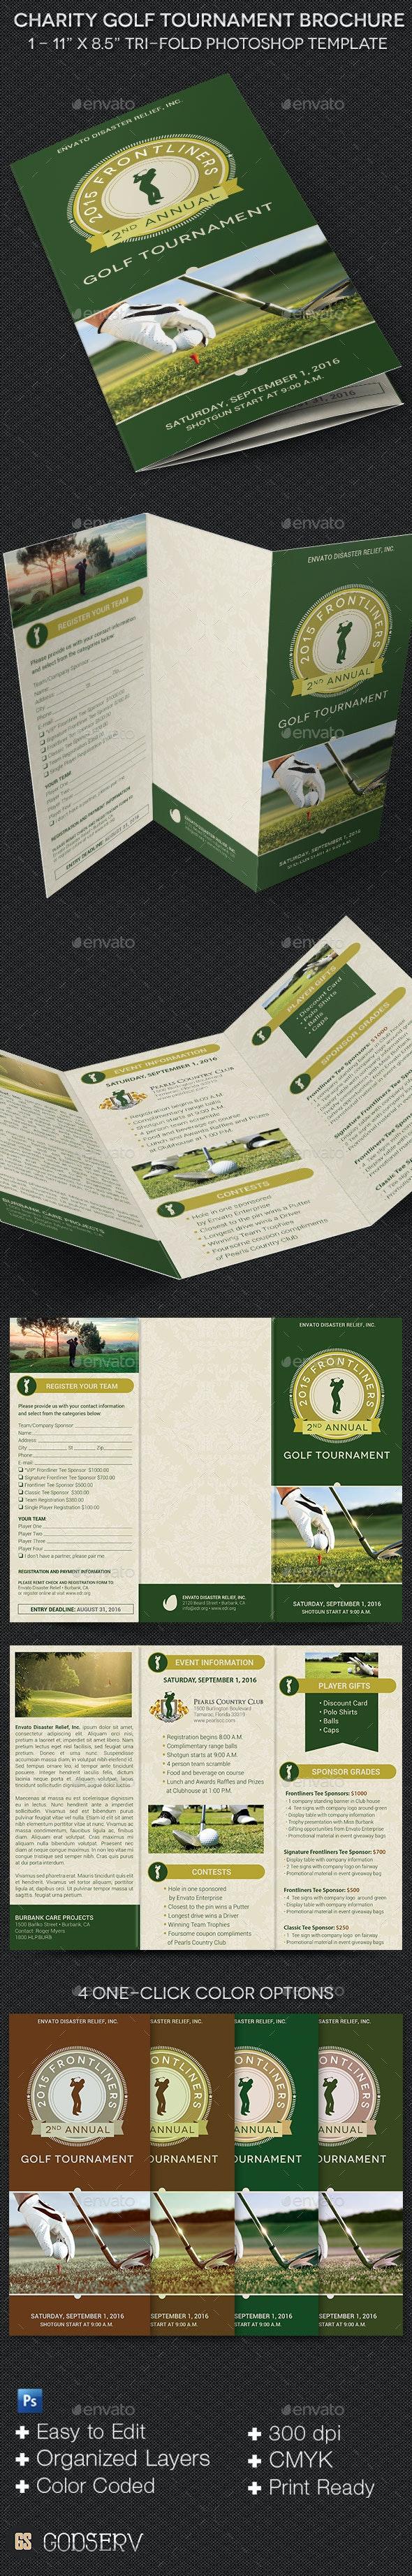 Charity Golf Tournament Brochure Template - Informational Brochures